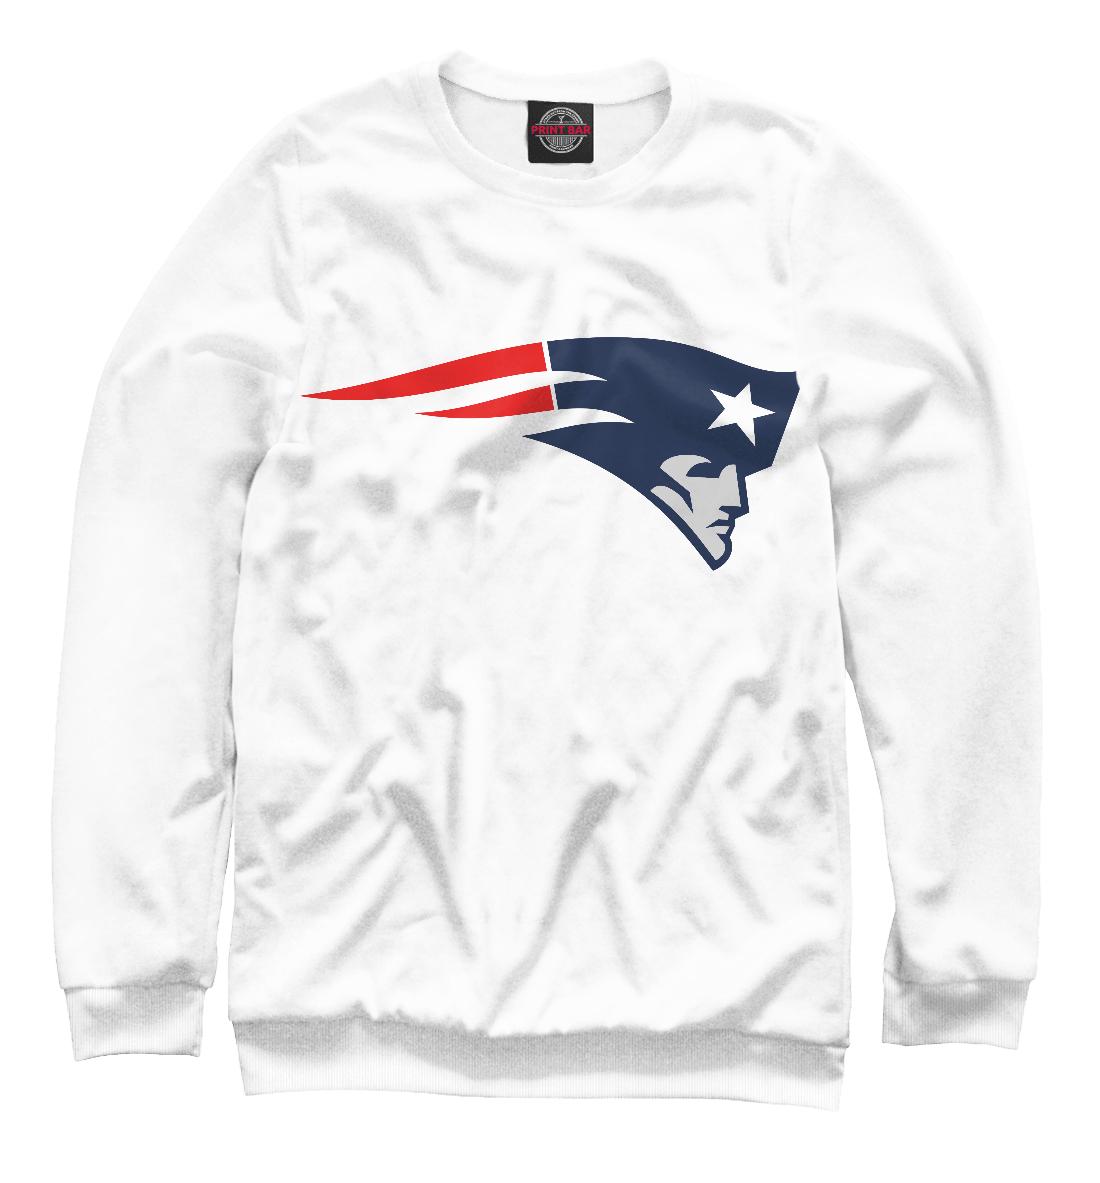 New England Patriots недорого